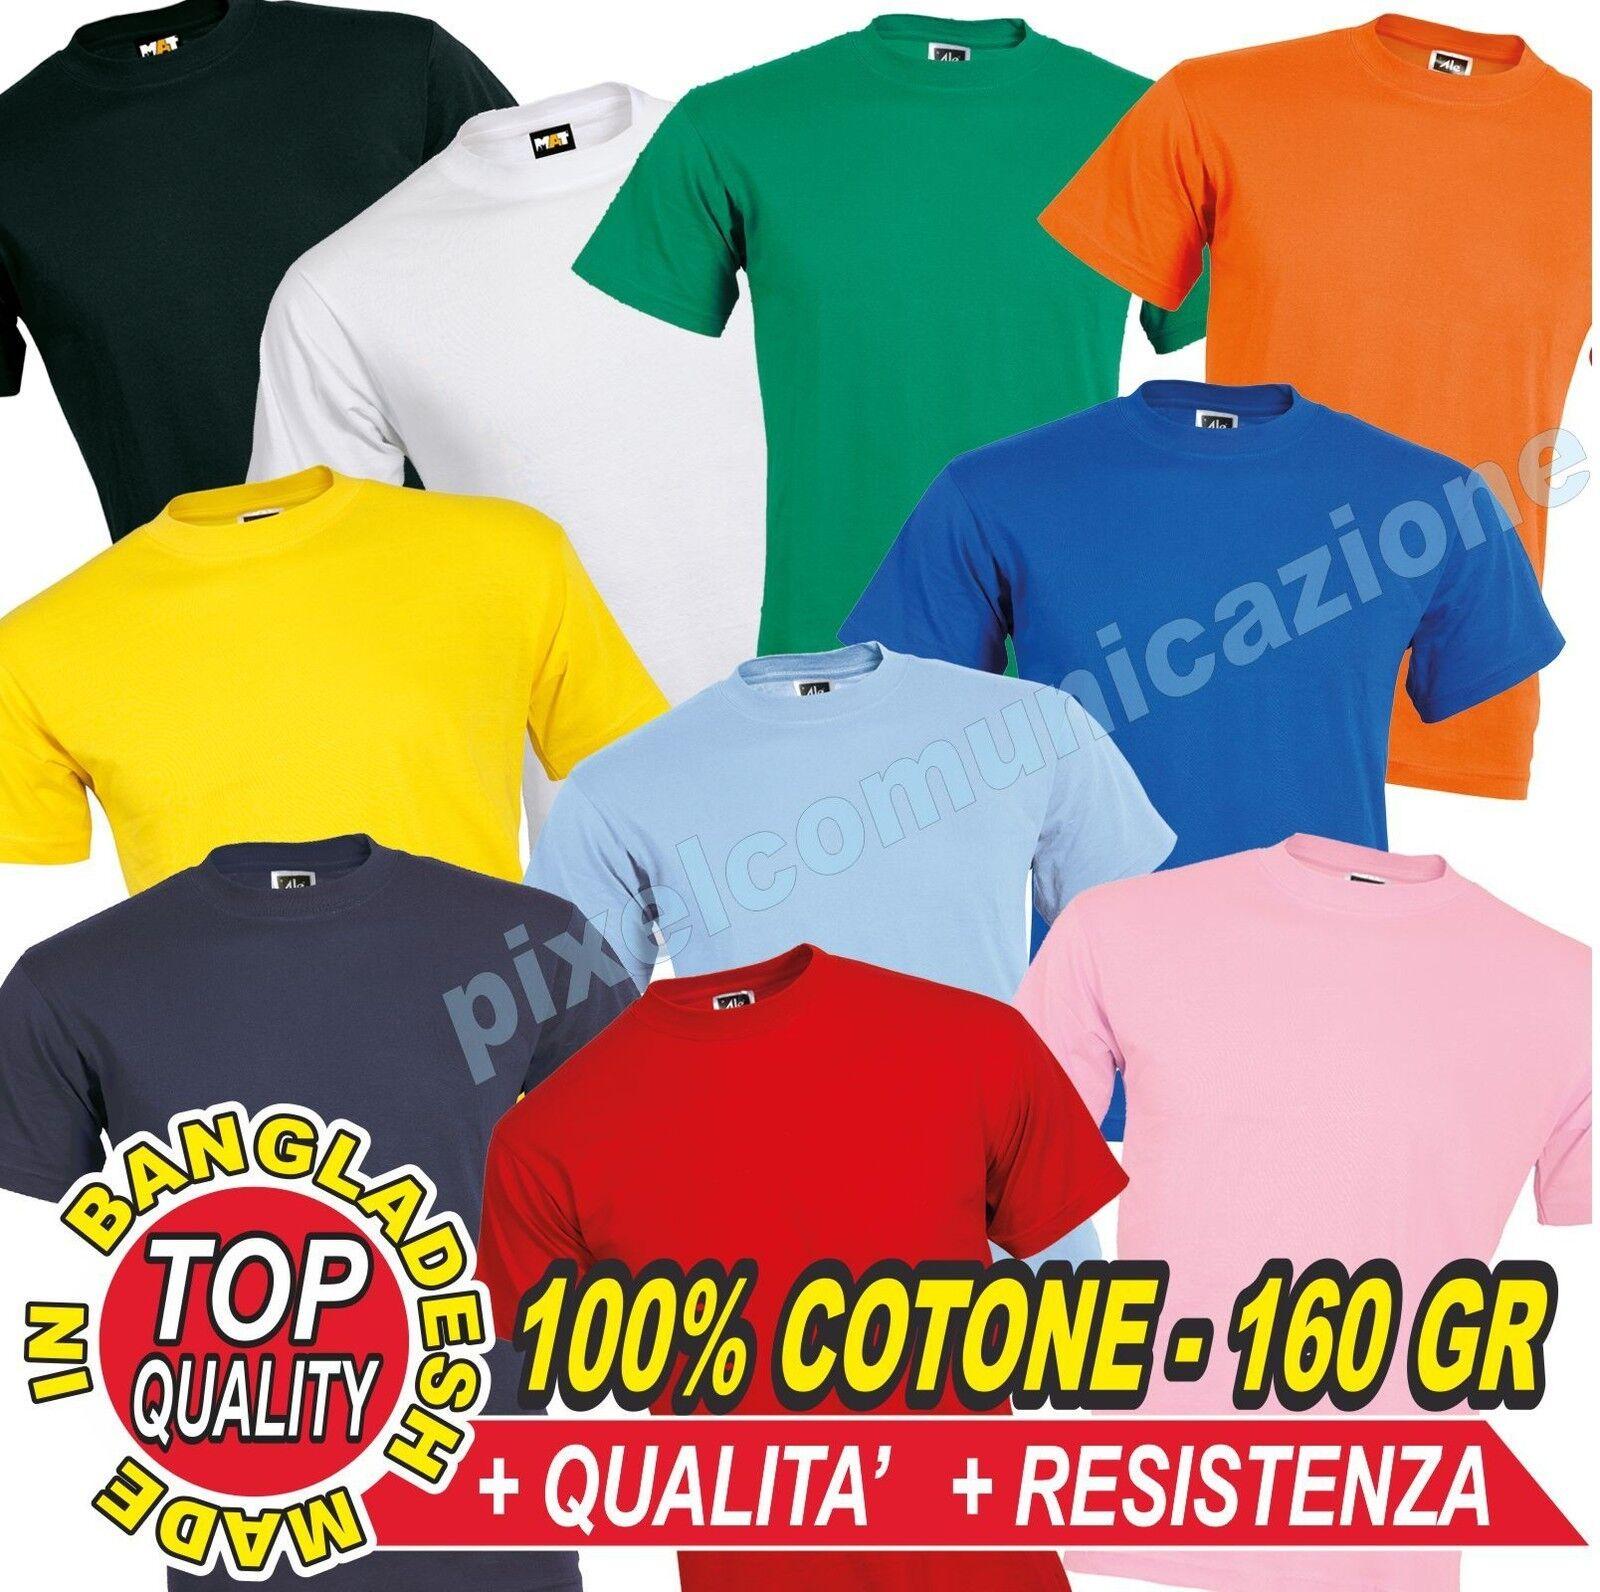 20 T SHIRT MAGLIETTE MANICHE CORTE OUTLET STOCK AFFARE 100% COTONE T-SHIRT 160GR